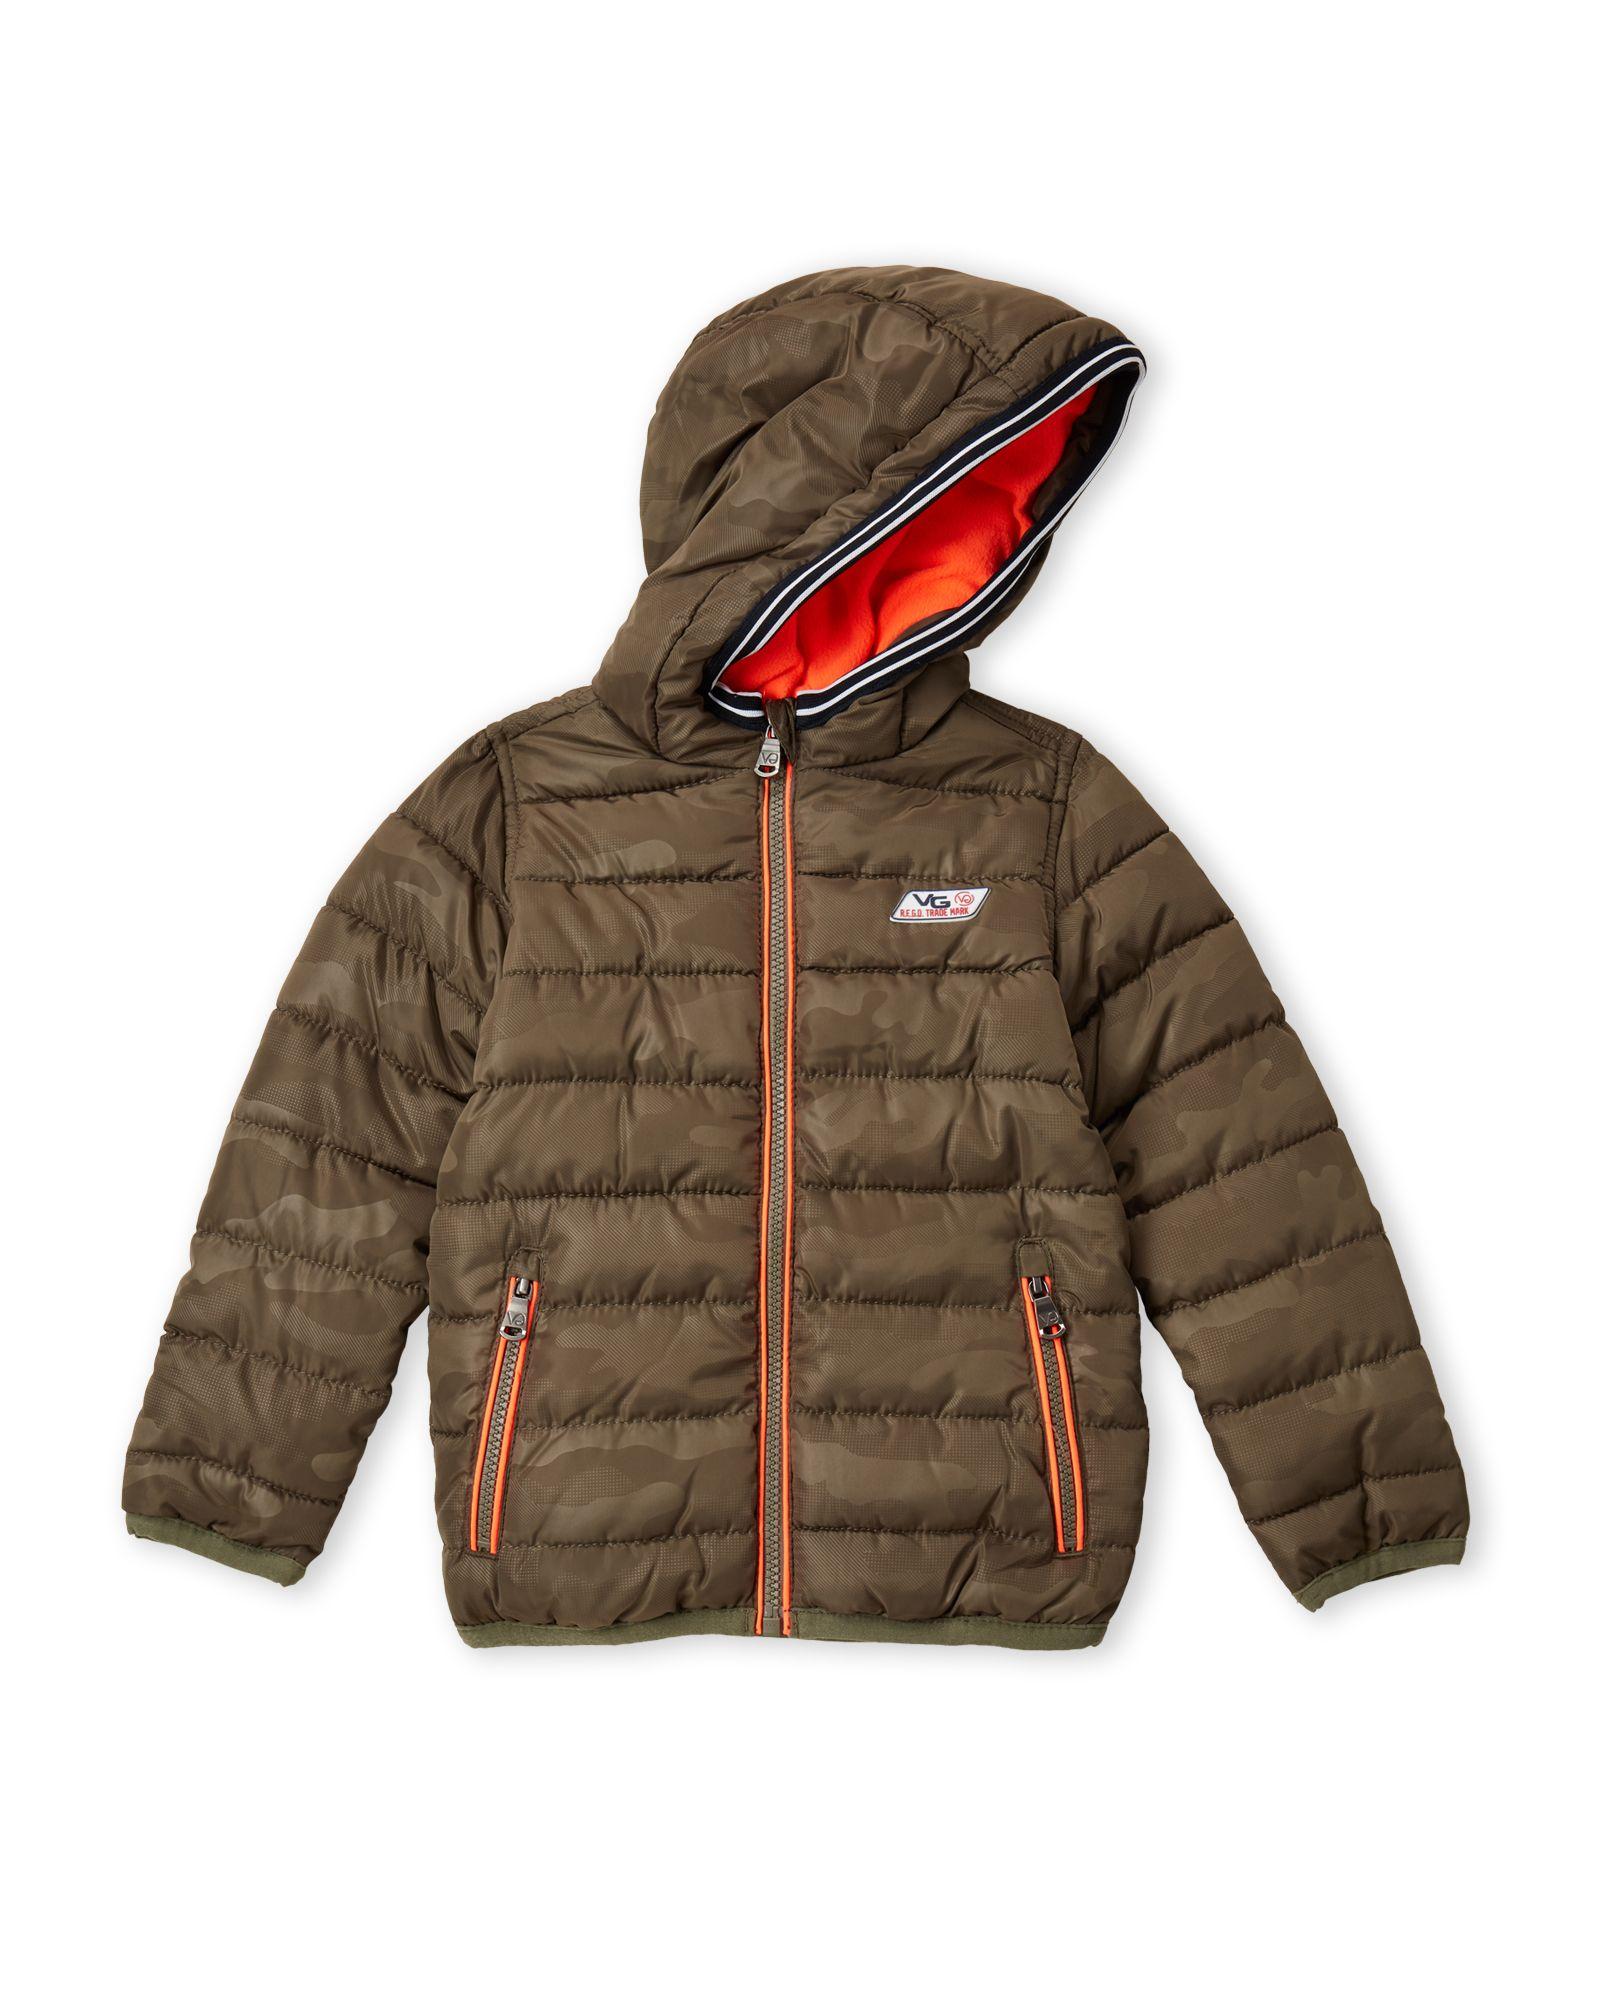 Vingino Boys 4 7 Turano Hooded Puffer Jacket Kids Outfits Vingino Winter Jackets [ 2000 x 1600 Pixel ]